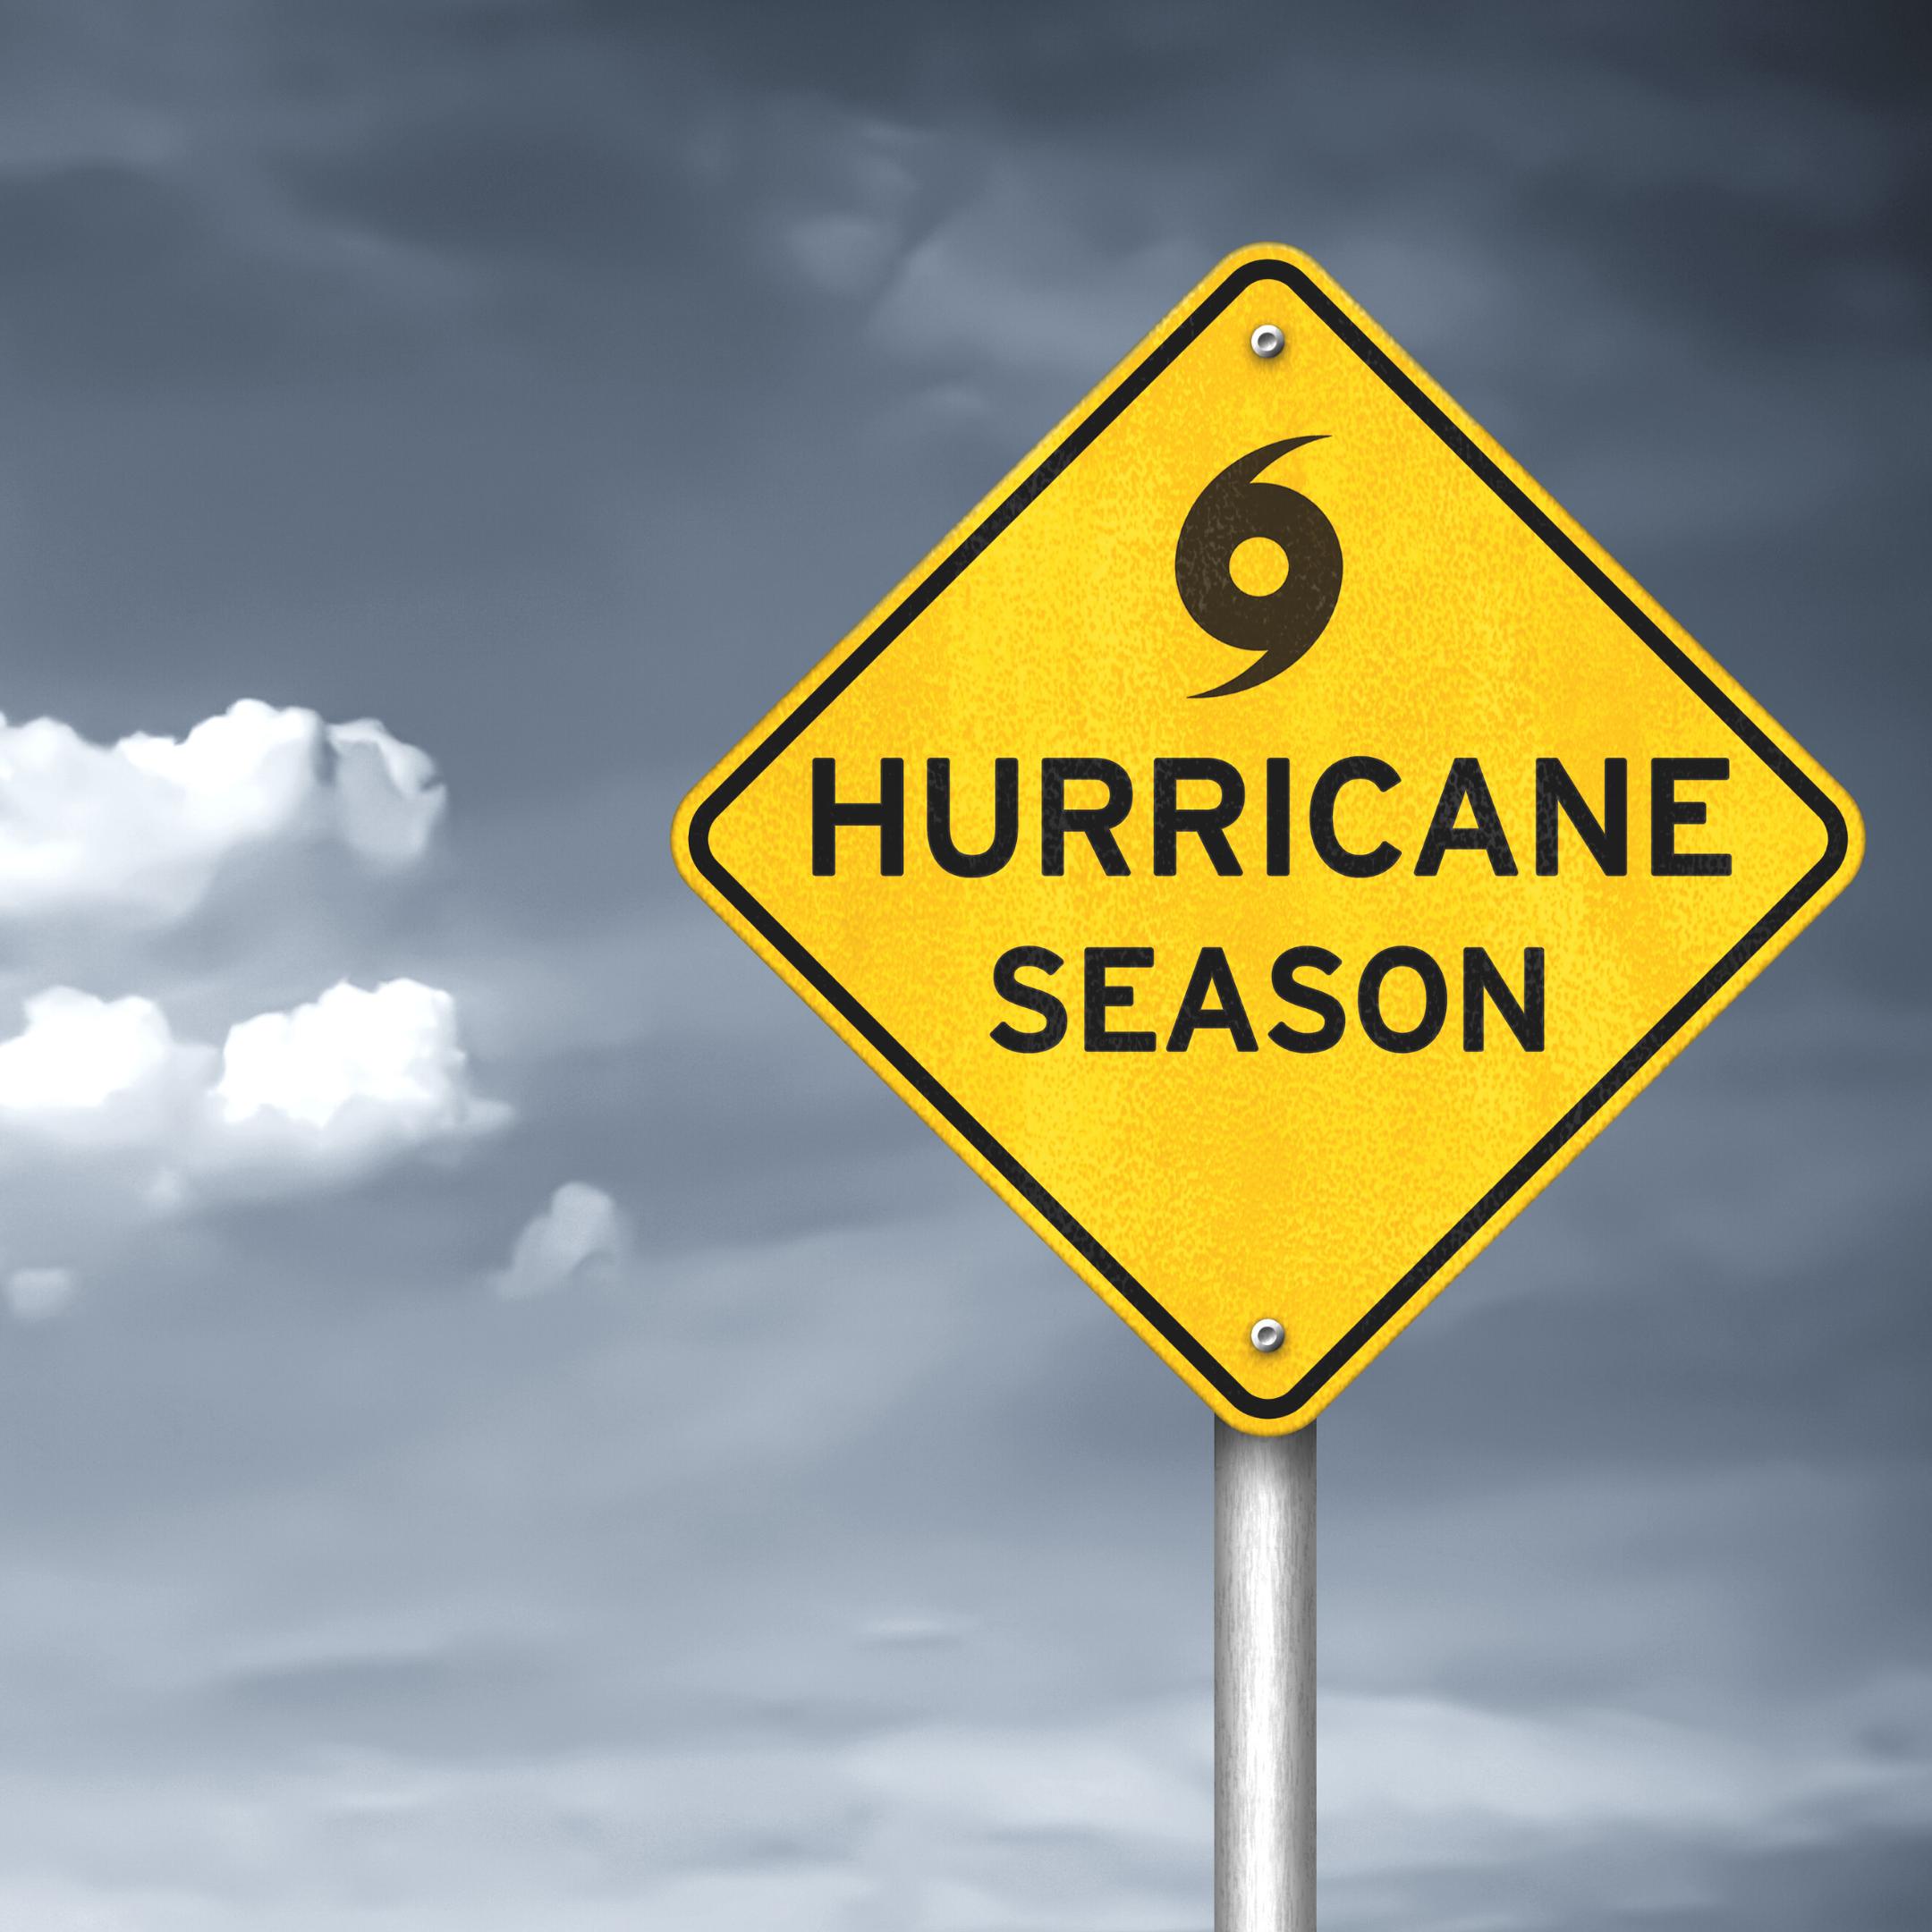 Hurricane Season Tips